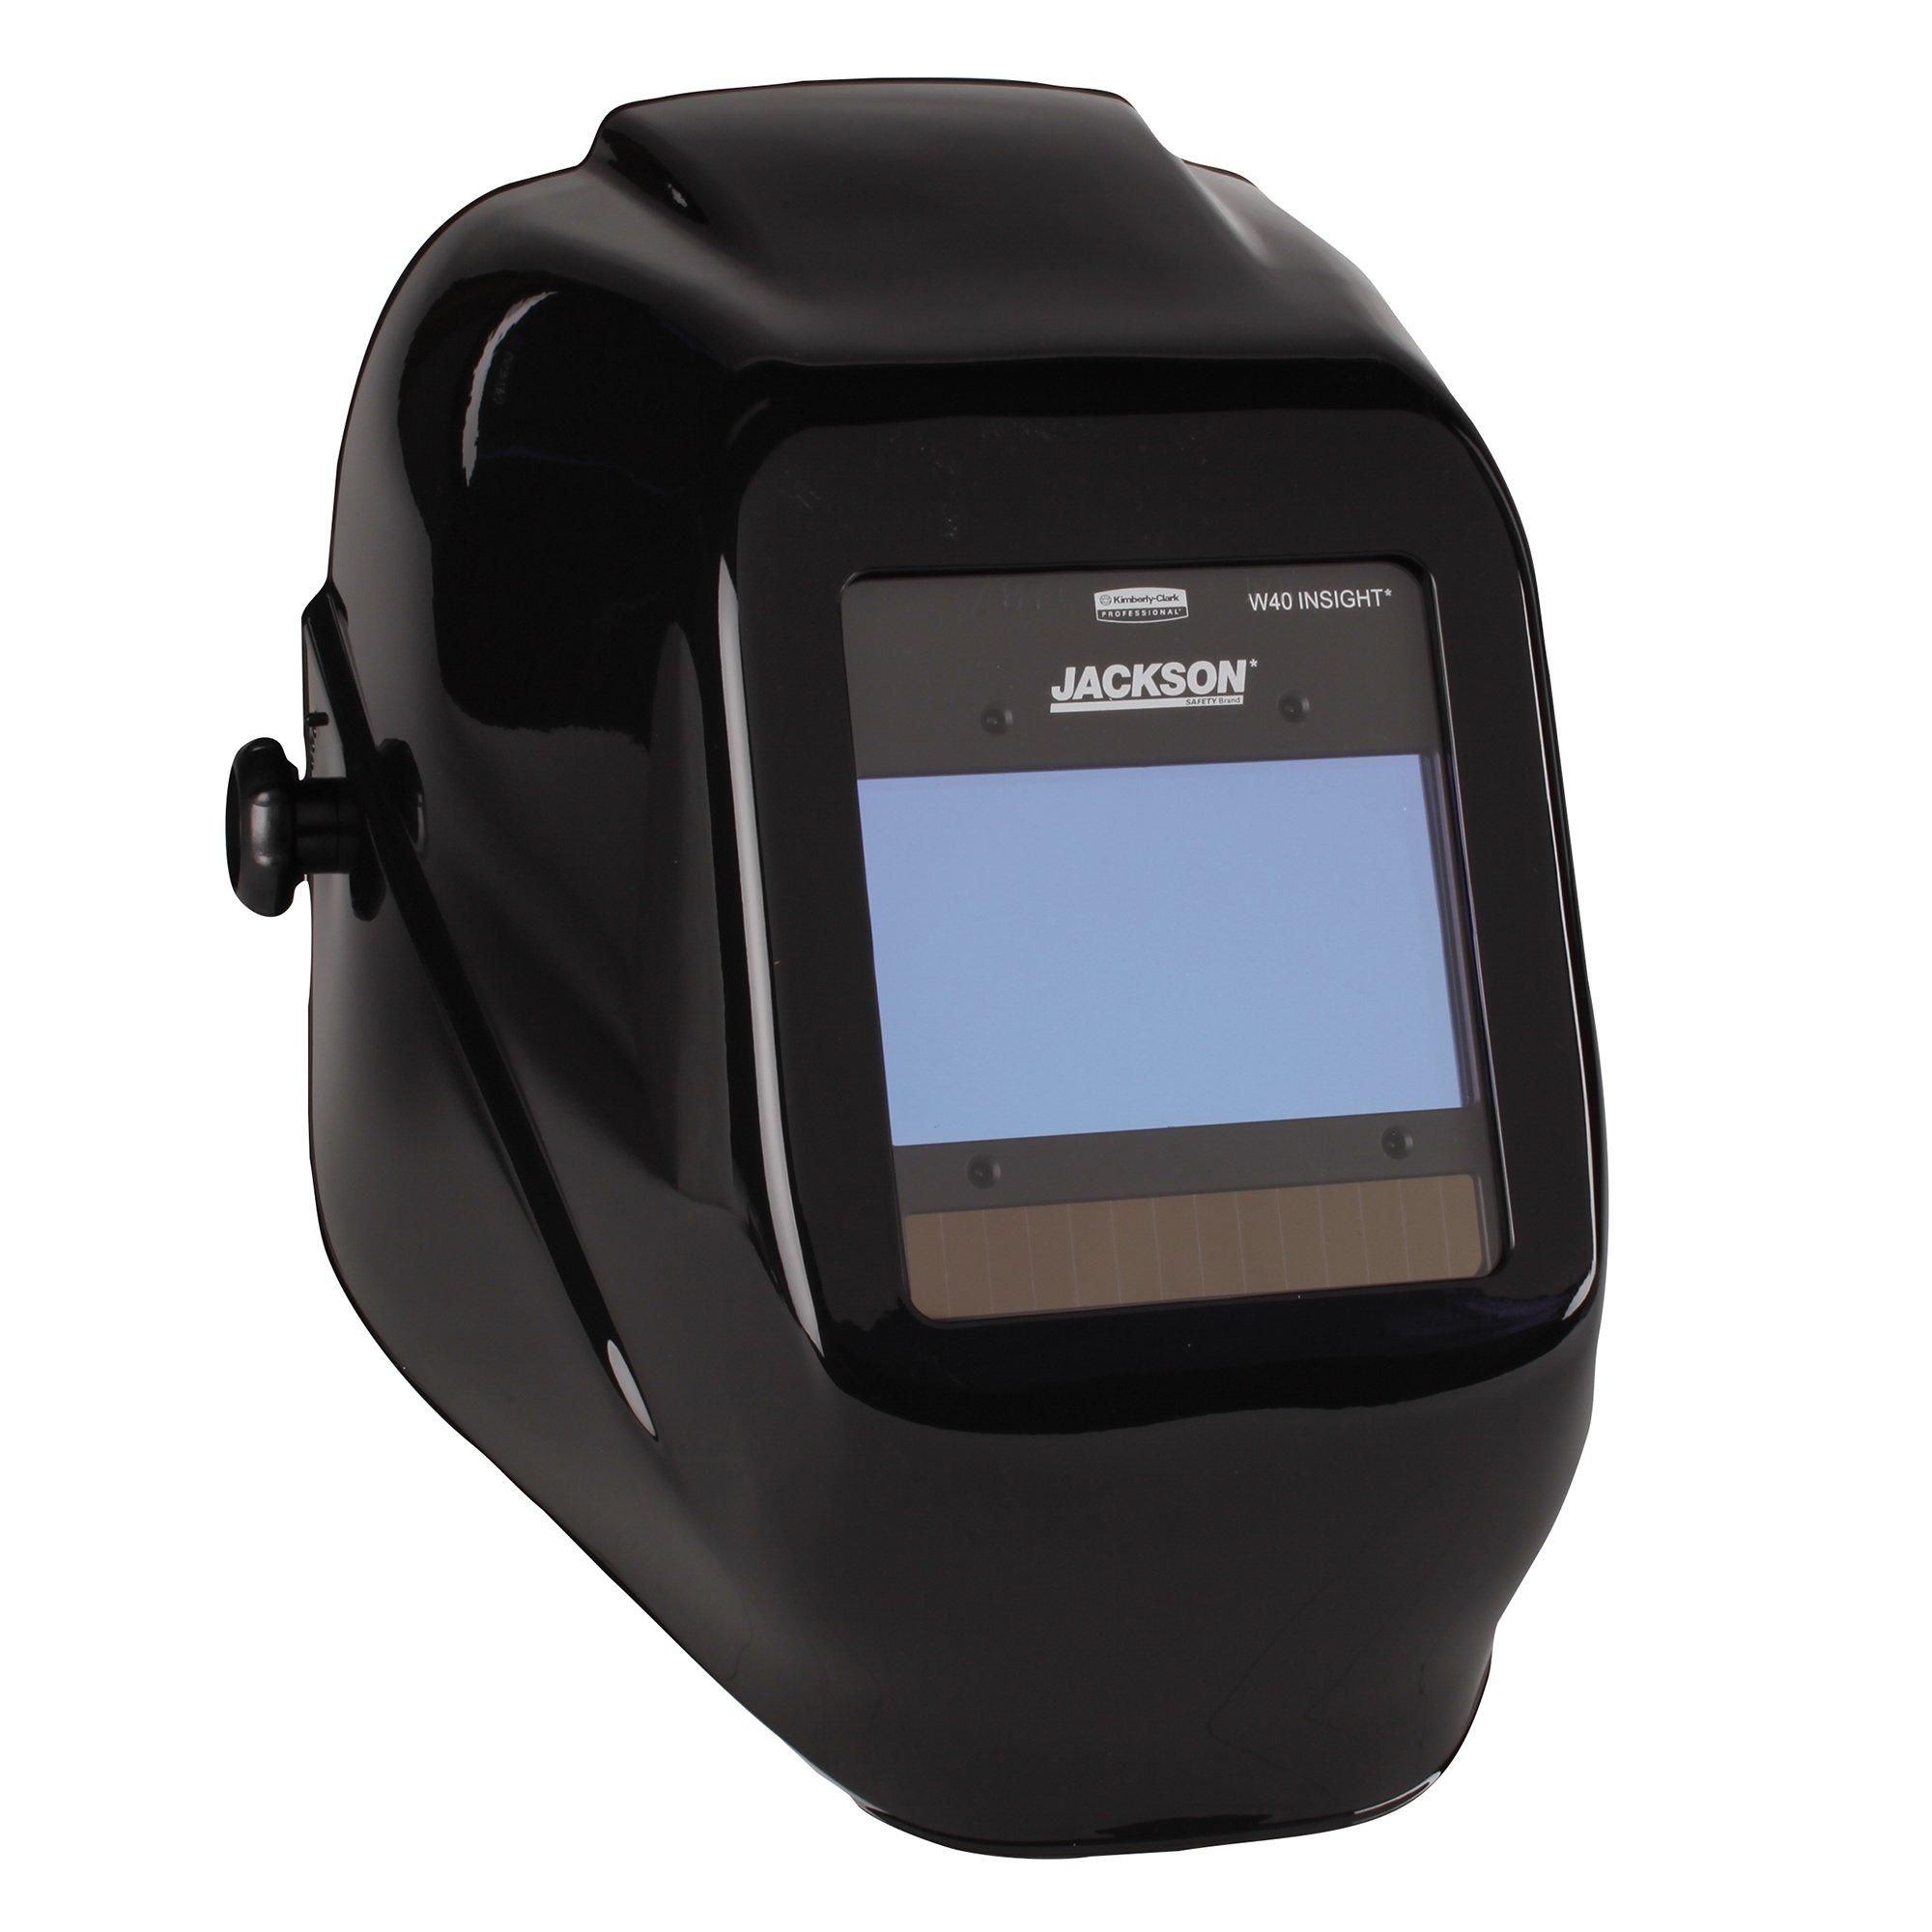 Jackson Safety 46131 Insight Variable Auto Darkening Welding Helmet, HaloX ,Black by Jackson Safety